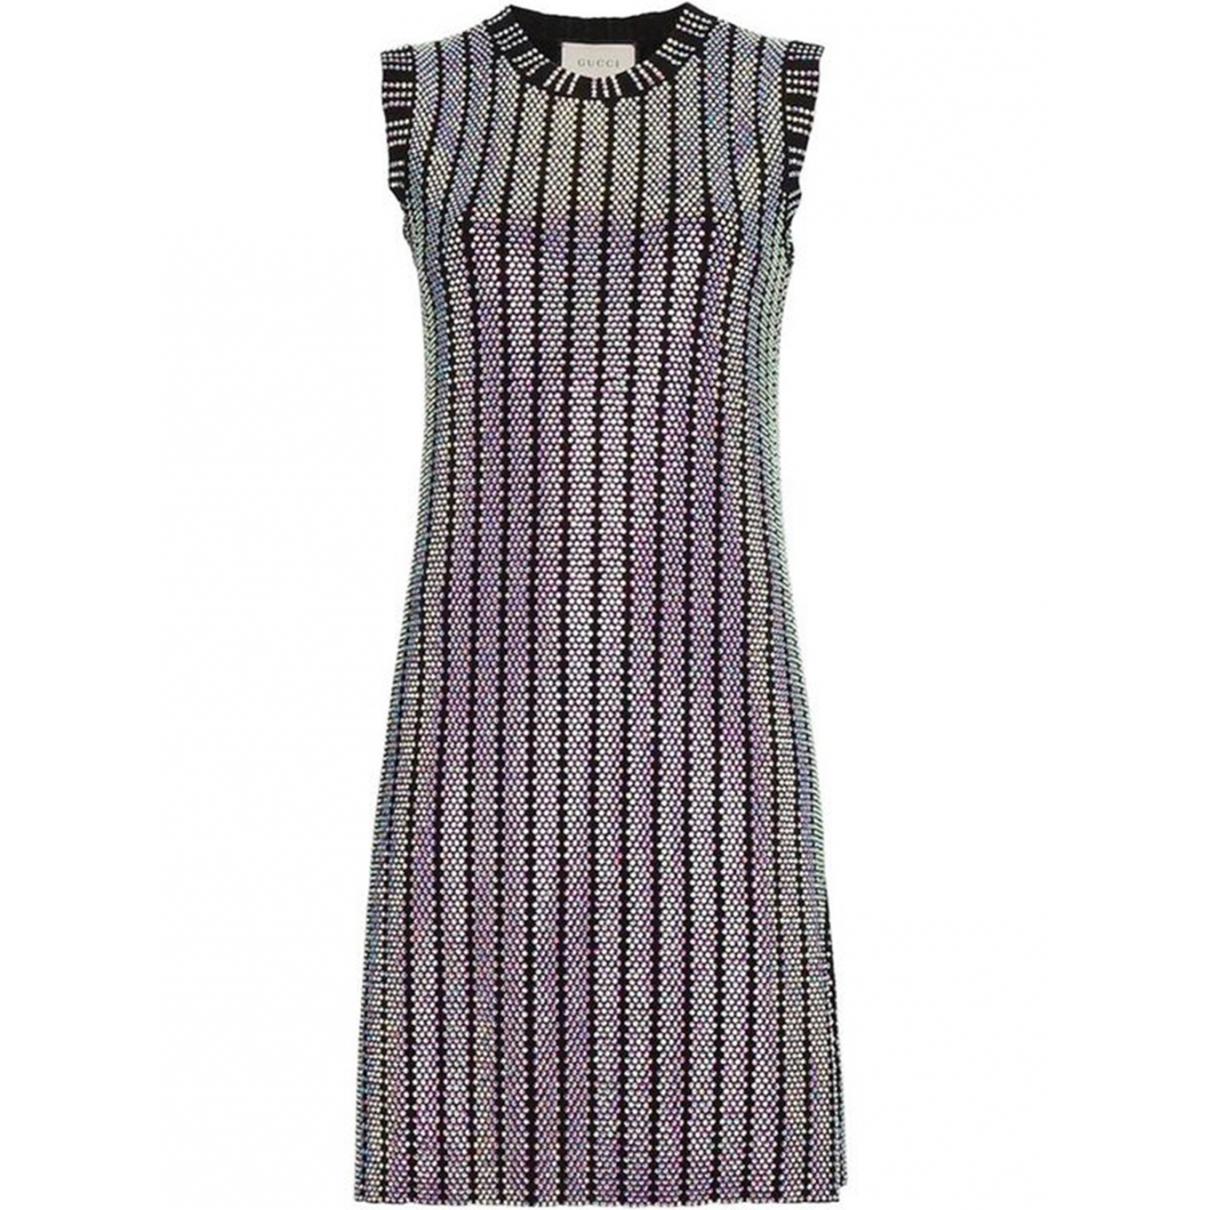 Gucci \N Silver dress for Women XS International